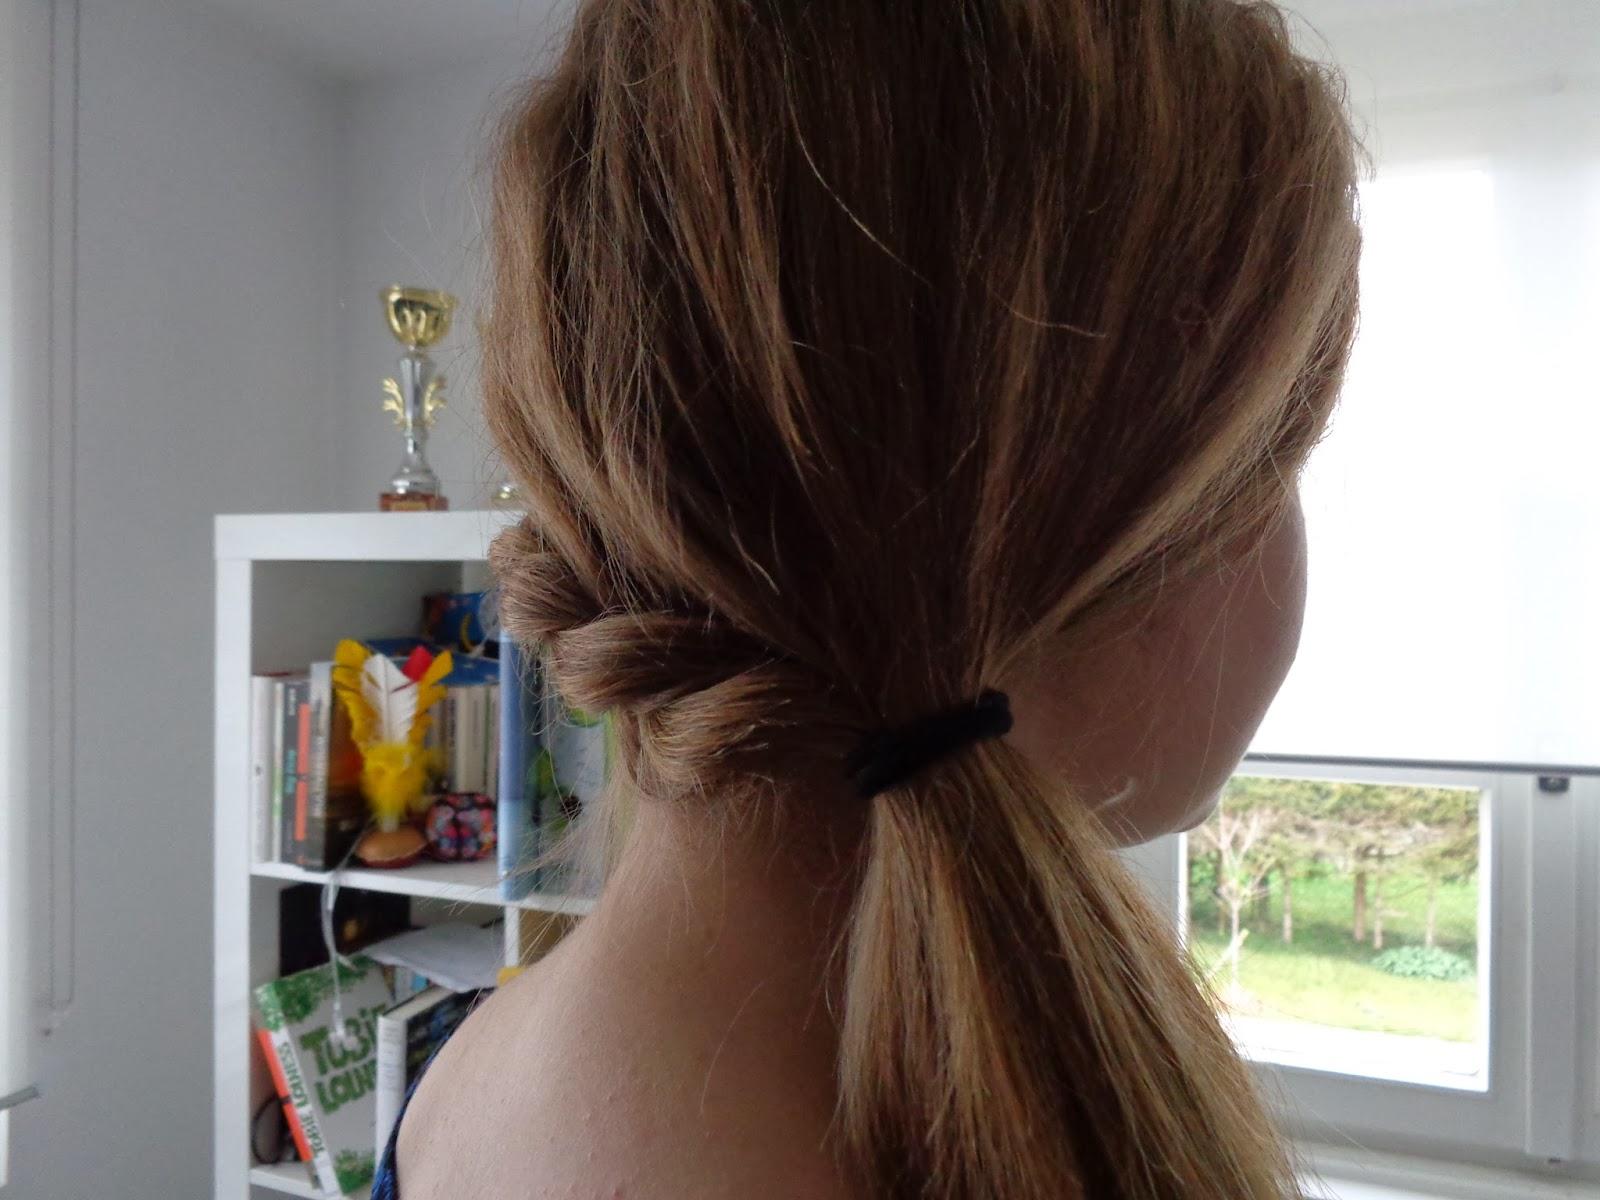 Little lordies tutoriel coiffure 2 queue de cheval avec tresse - Tresse queue de cheval ...